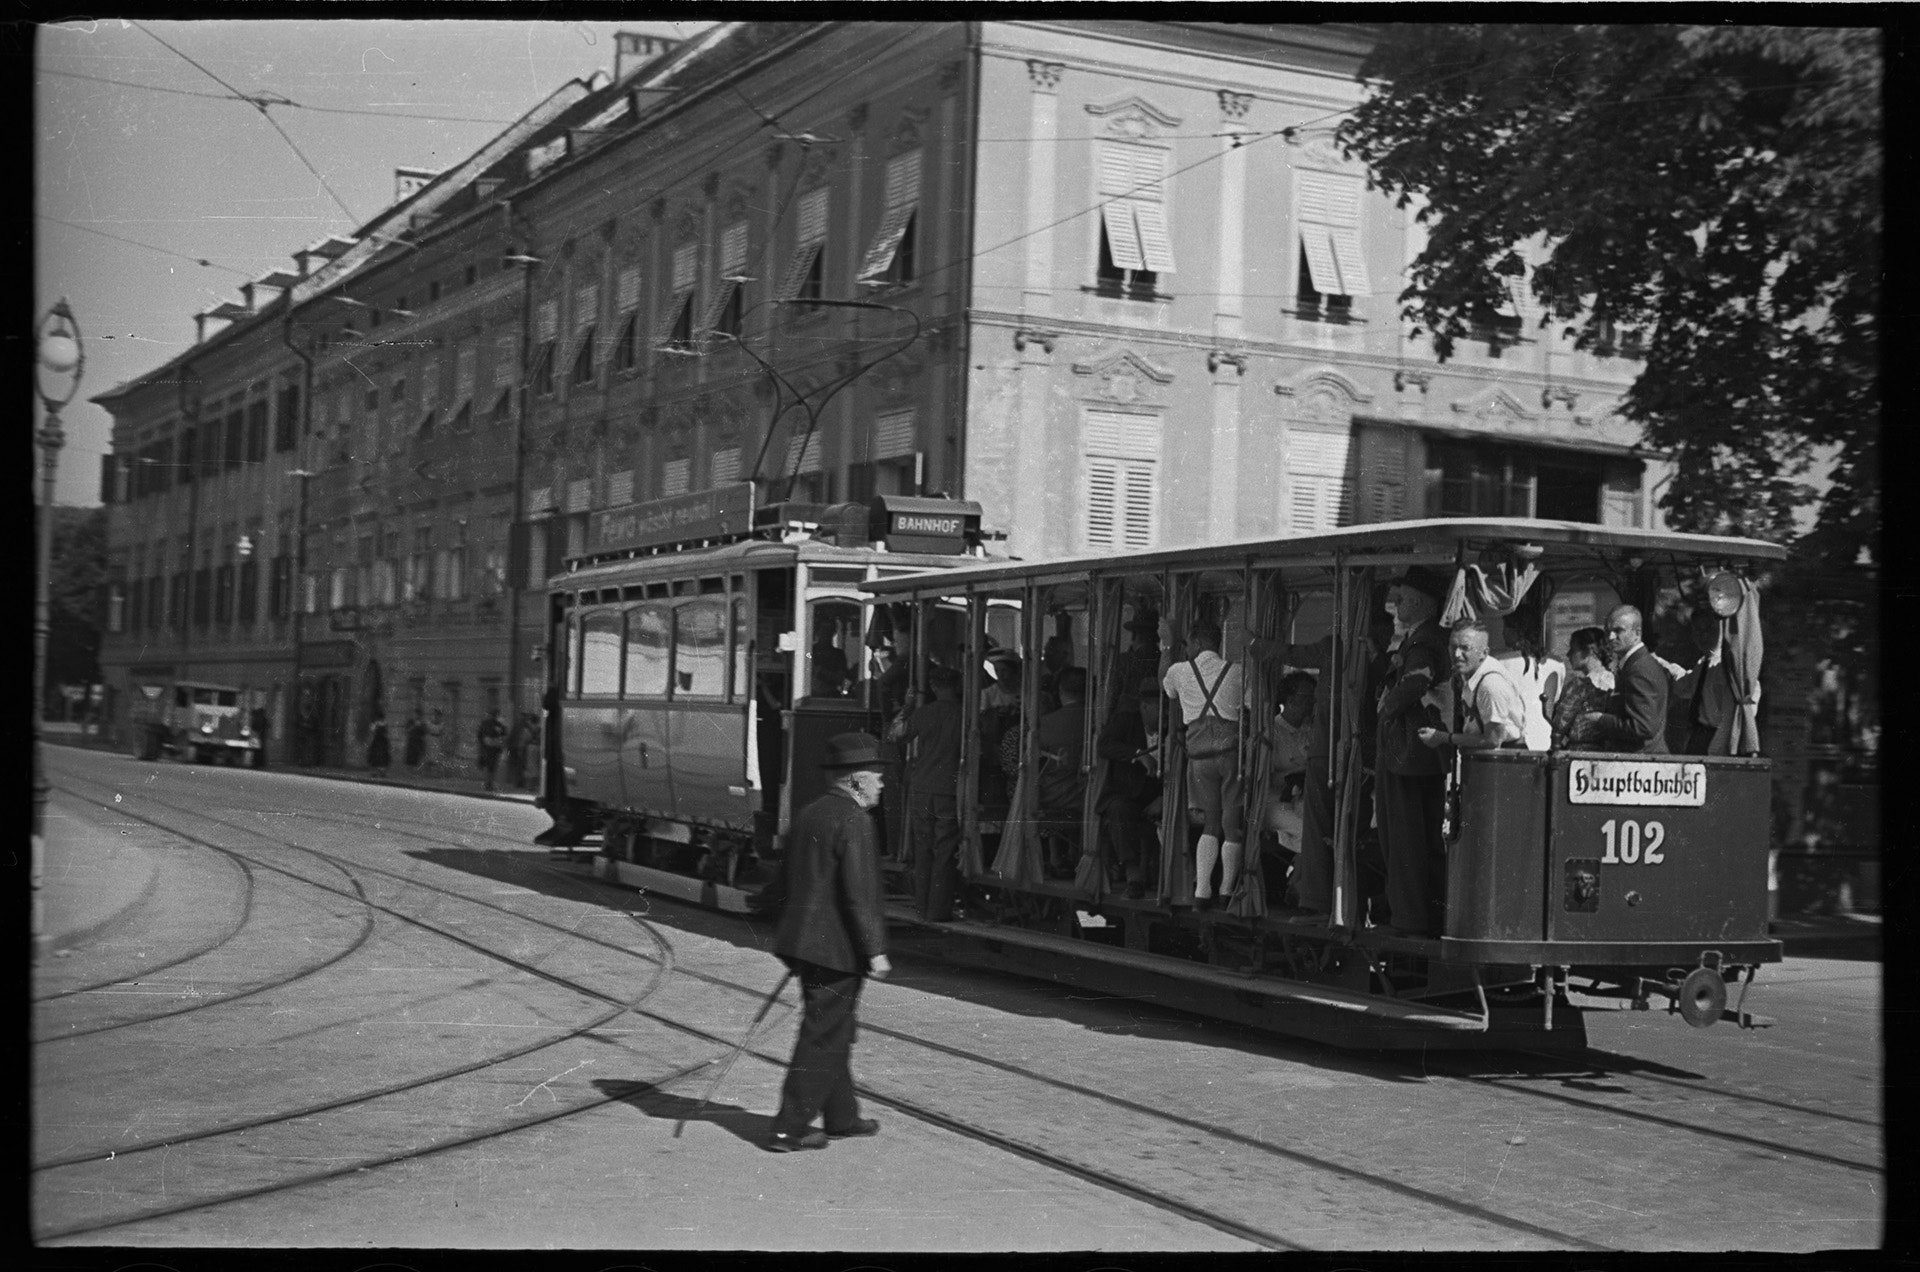 Учеба в институте. Германия (территория Австрии после аншлюса), 1943 год